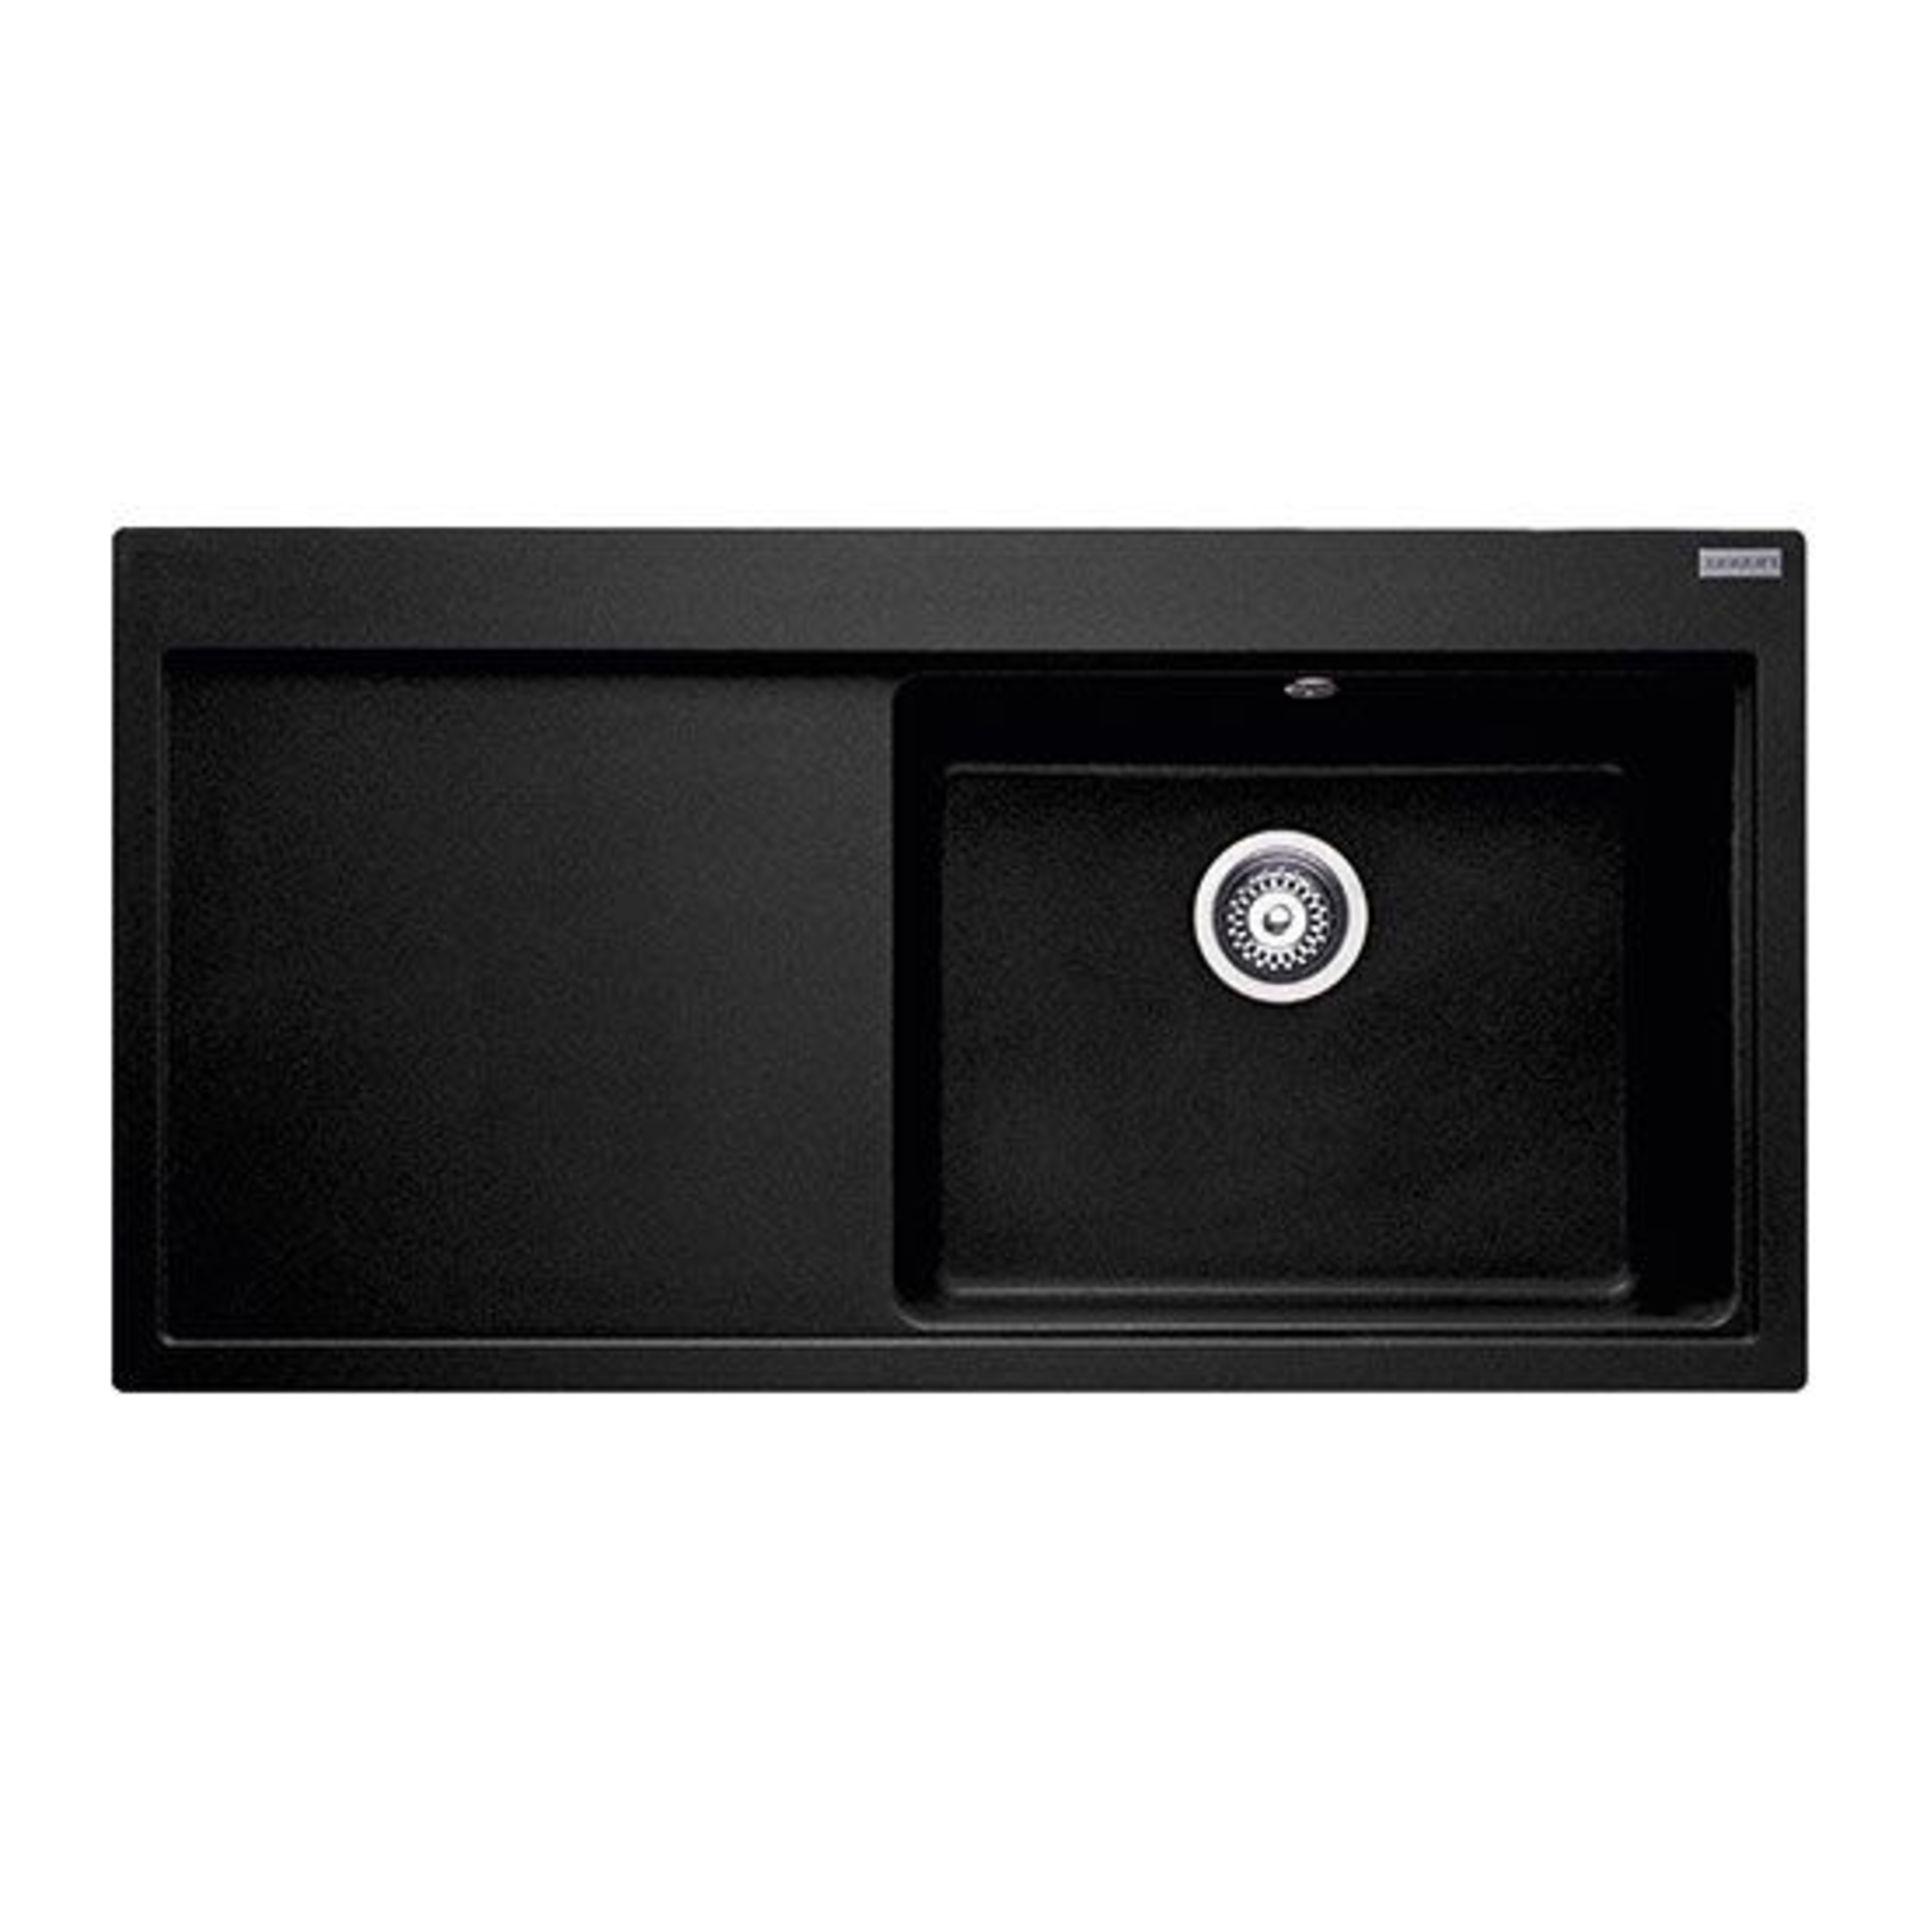 NEW (REF13) 1 x Franke Mythos MTG 611 Fragranite Onyx 1 Bowl Kitchen Sink - Left Hand Drainer 114.